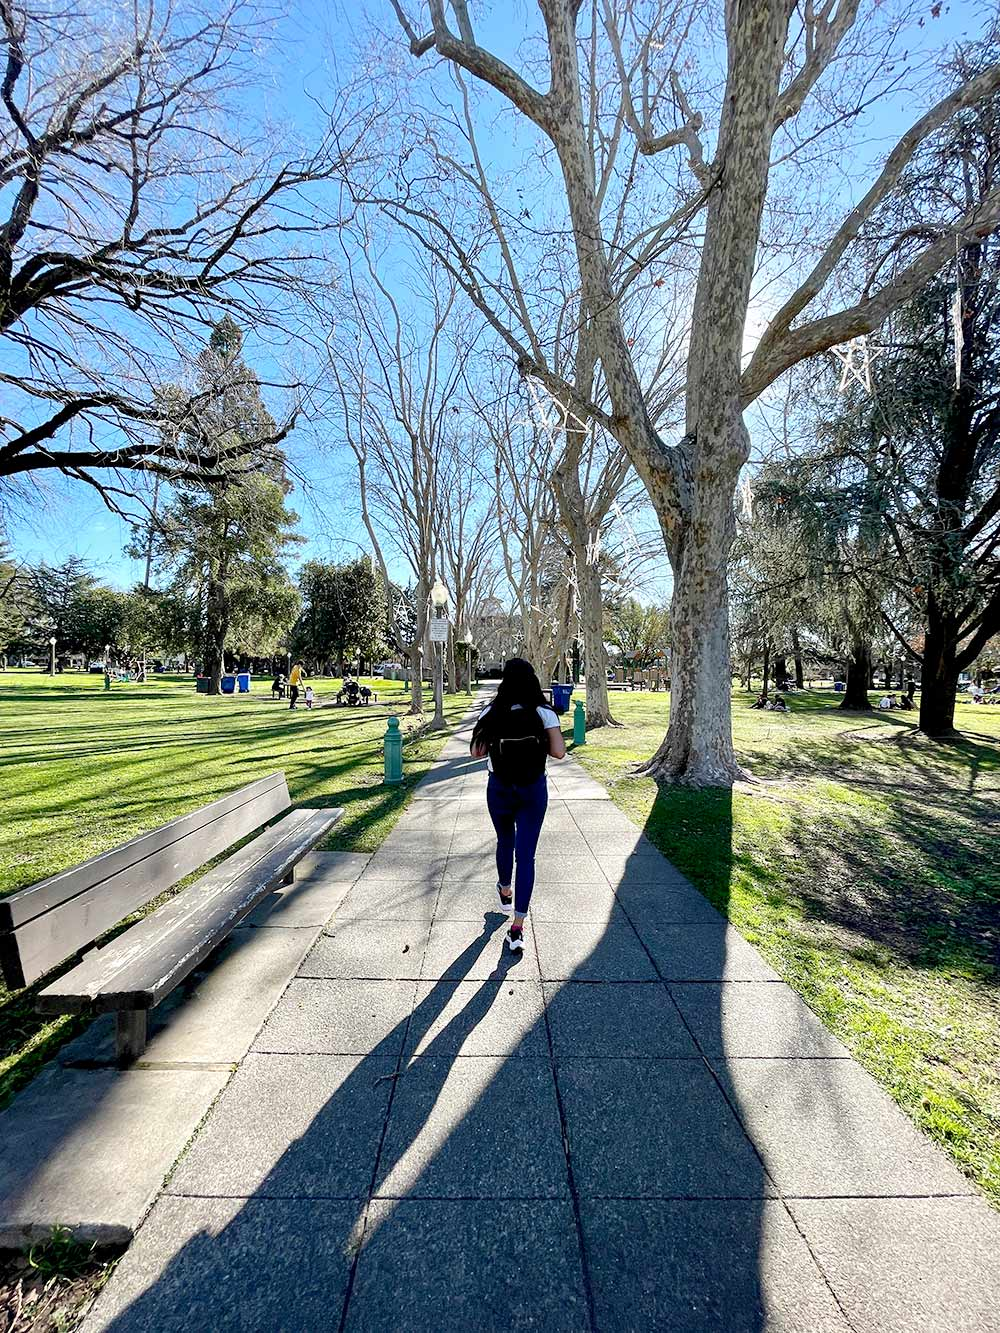 sonoma plaza ka walking